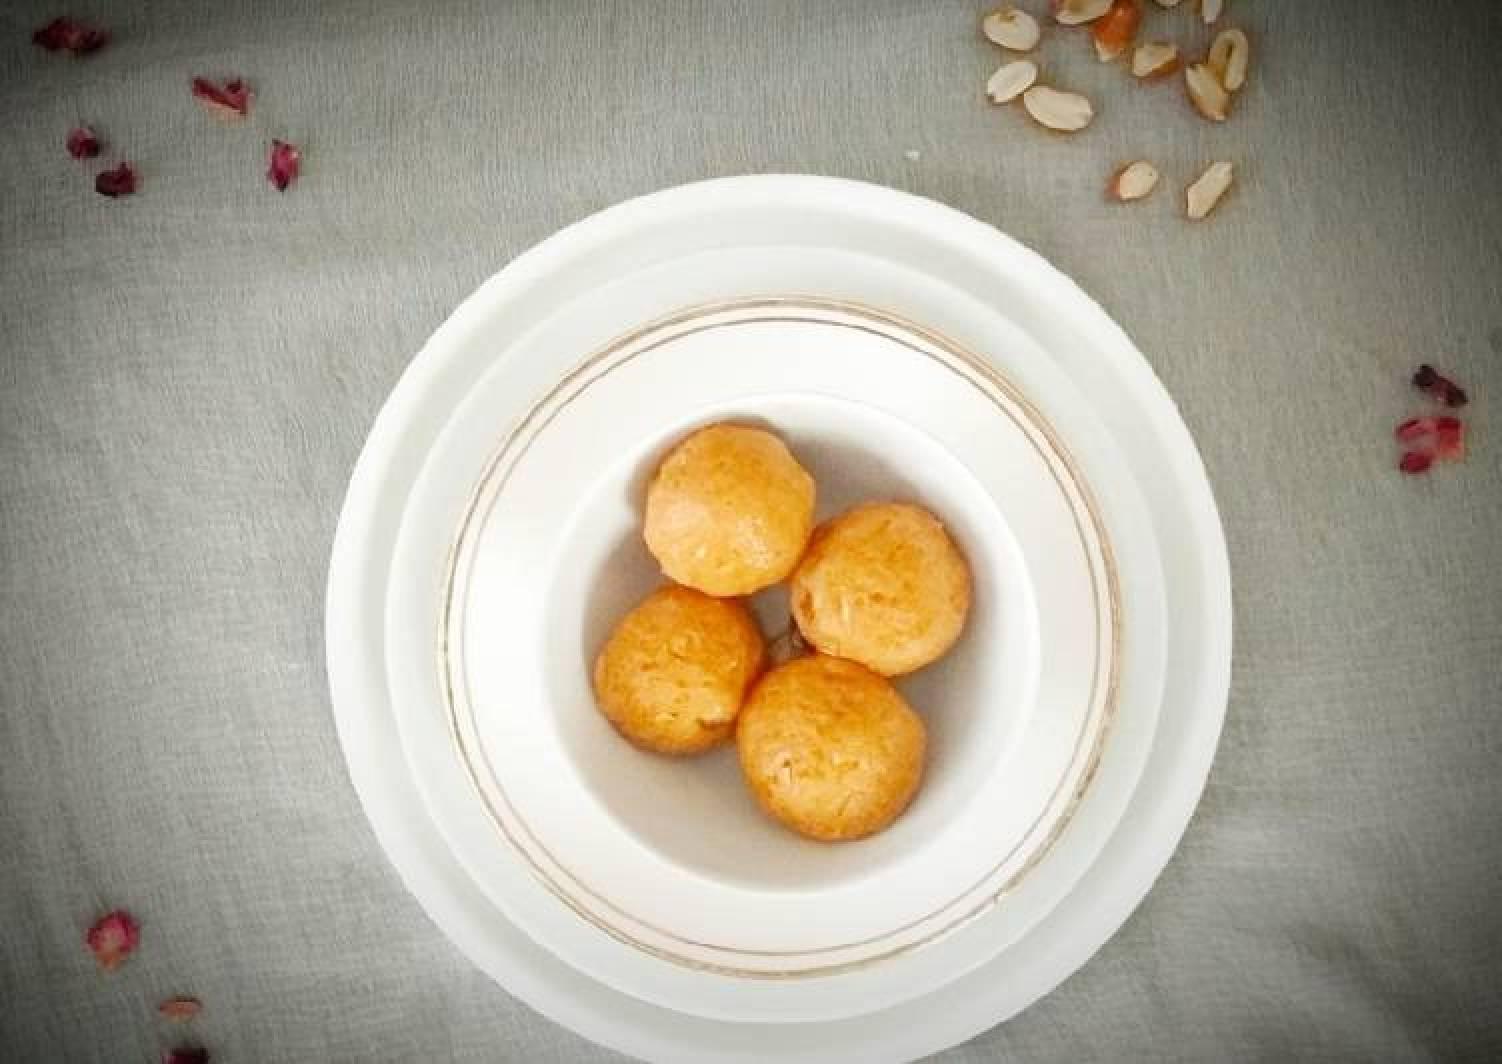 Crunchy Peanut Butter Balls - No Cook/ No Bake